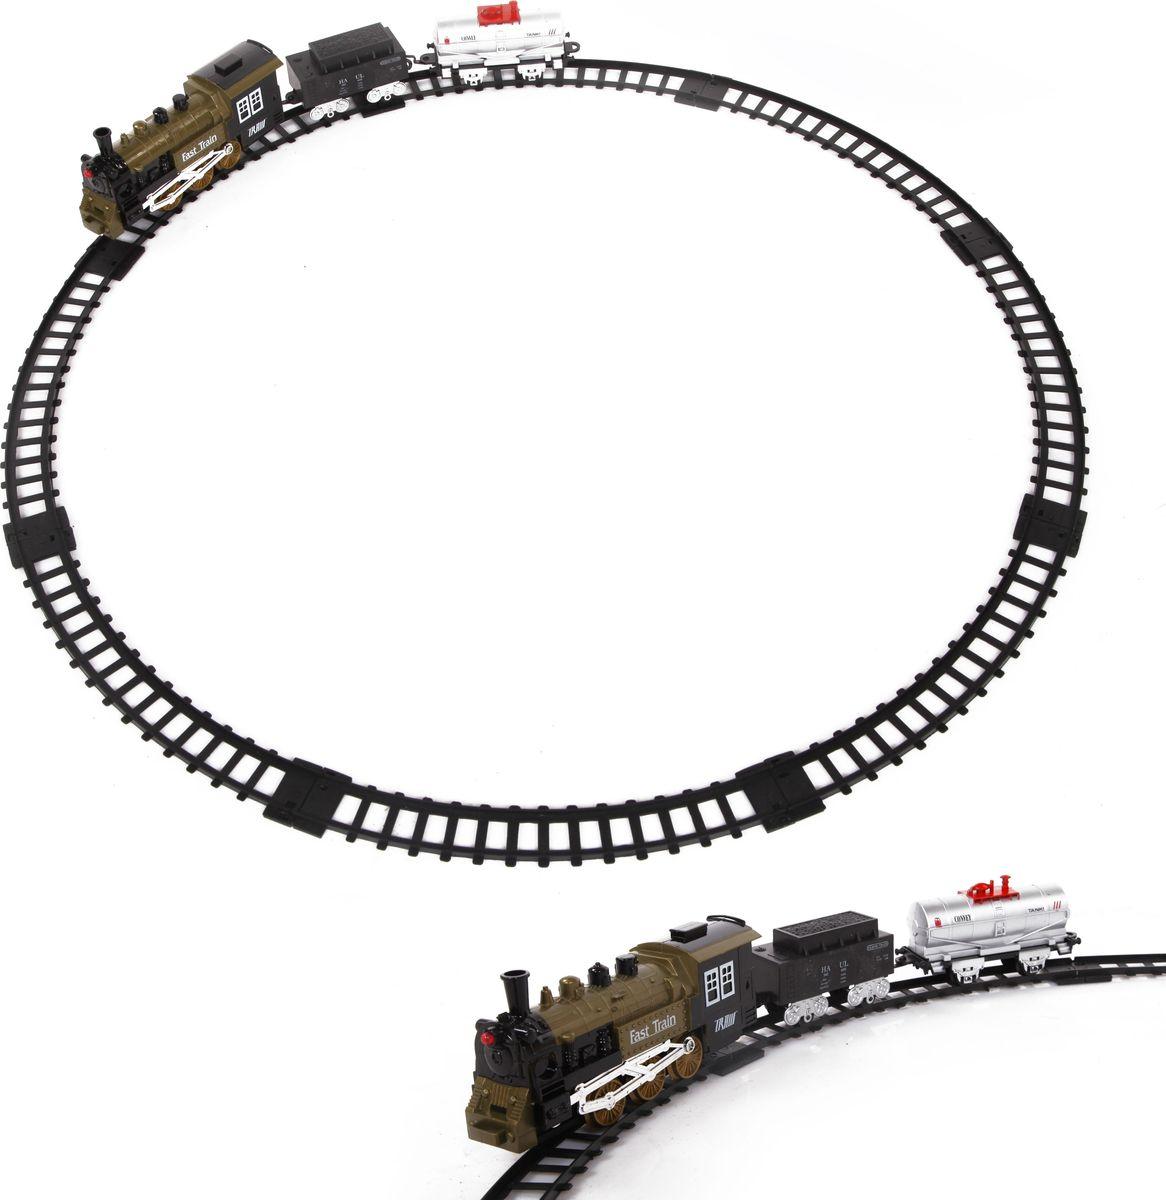 Yako Железная дорога Train And Toy Show Y1699018